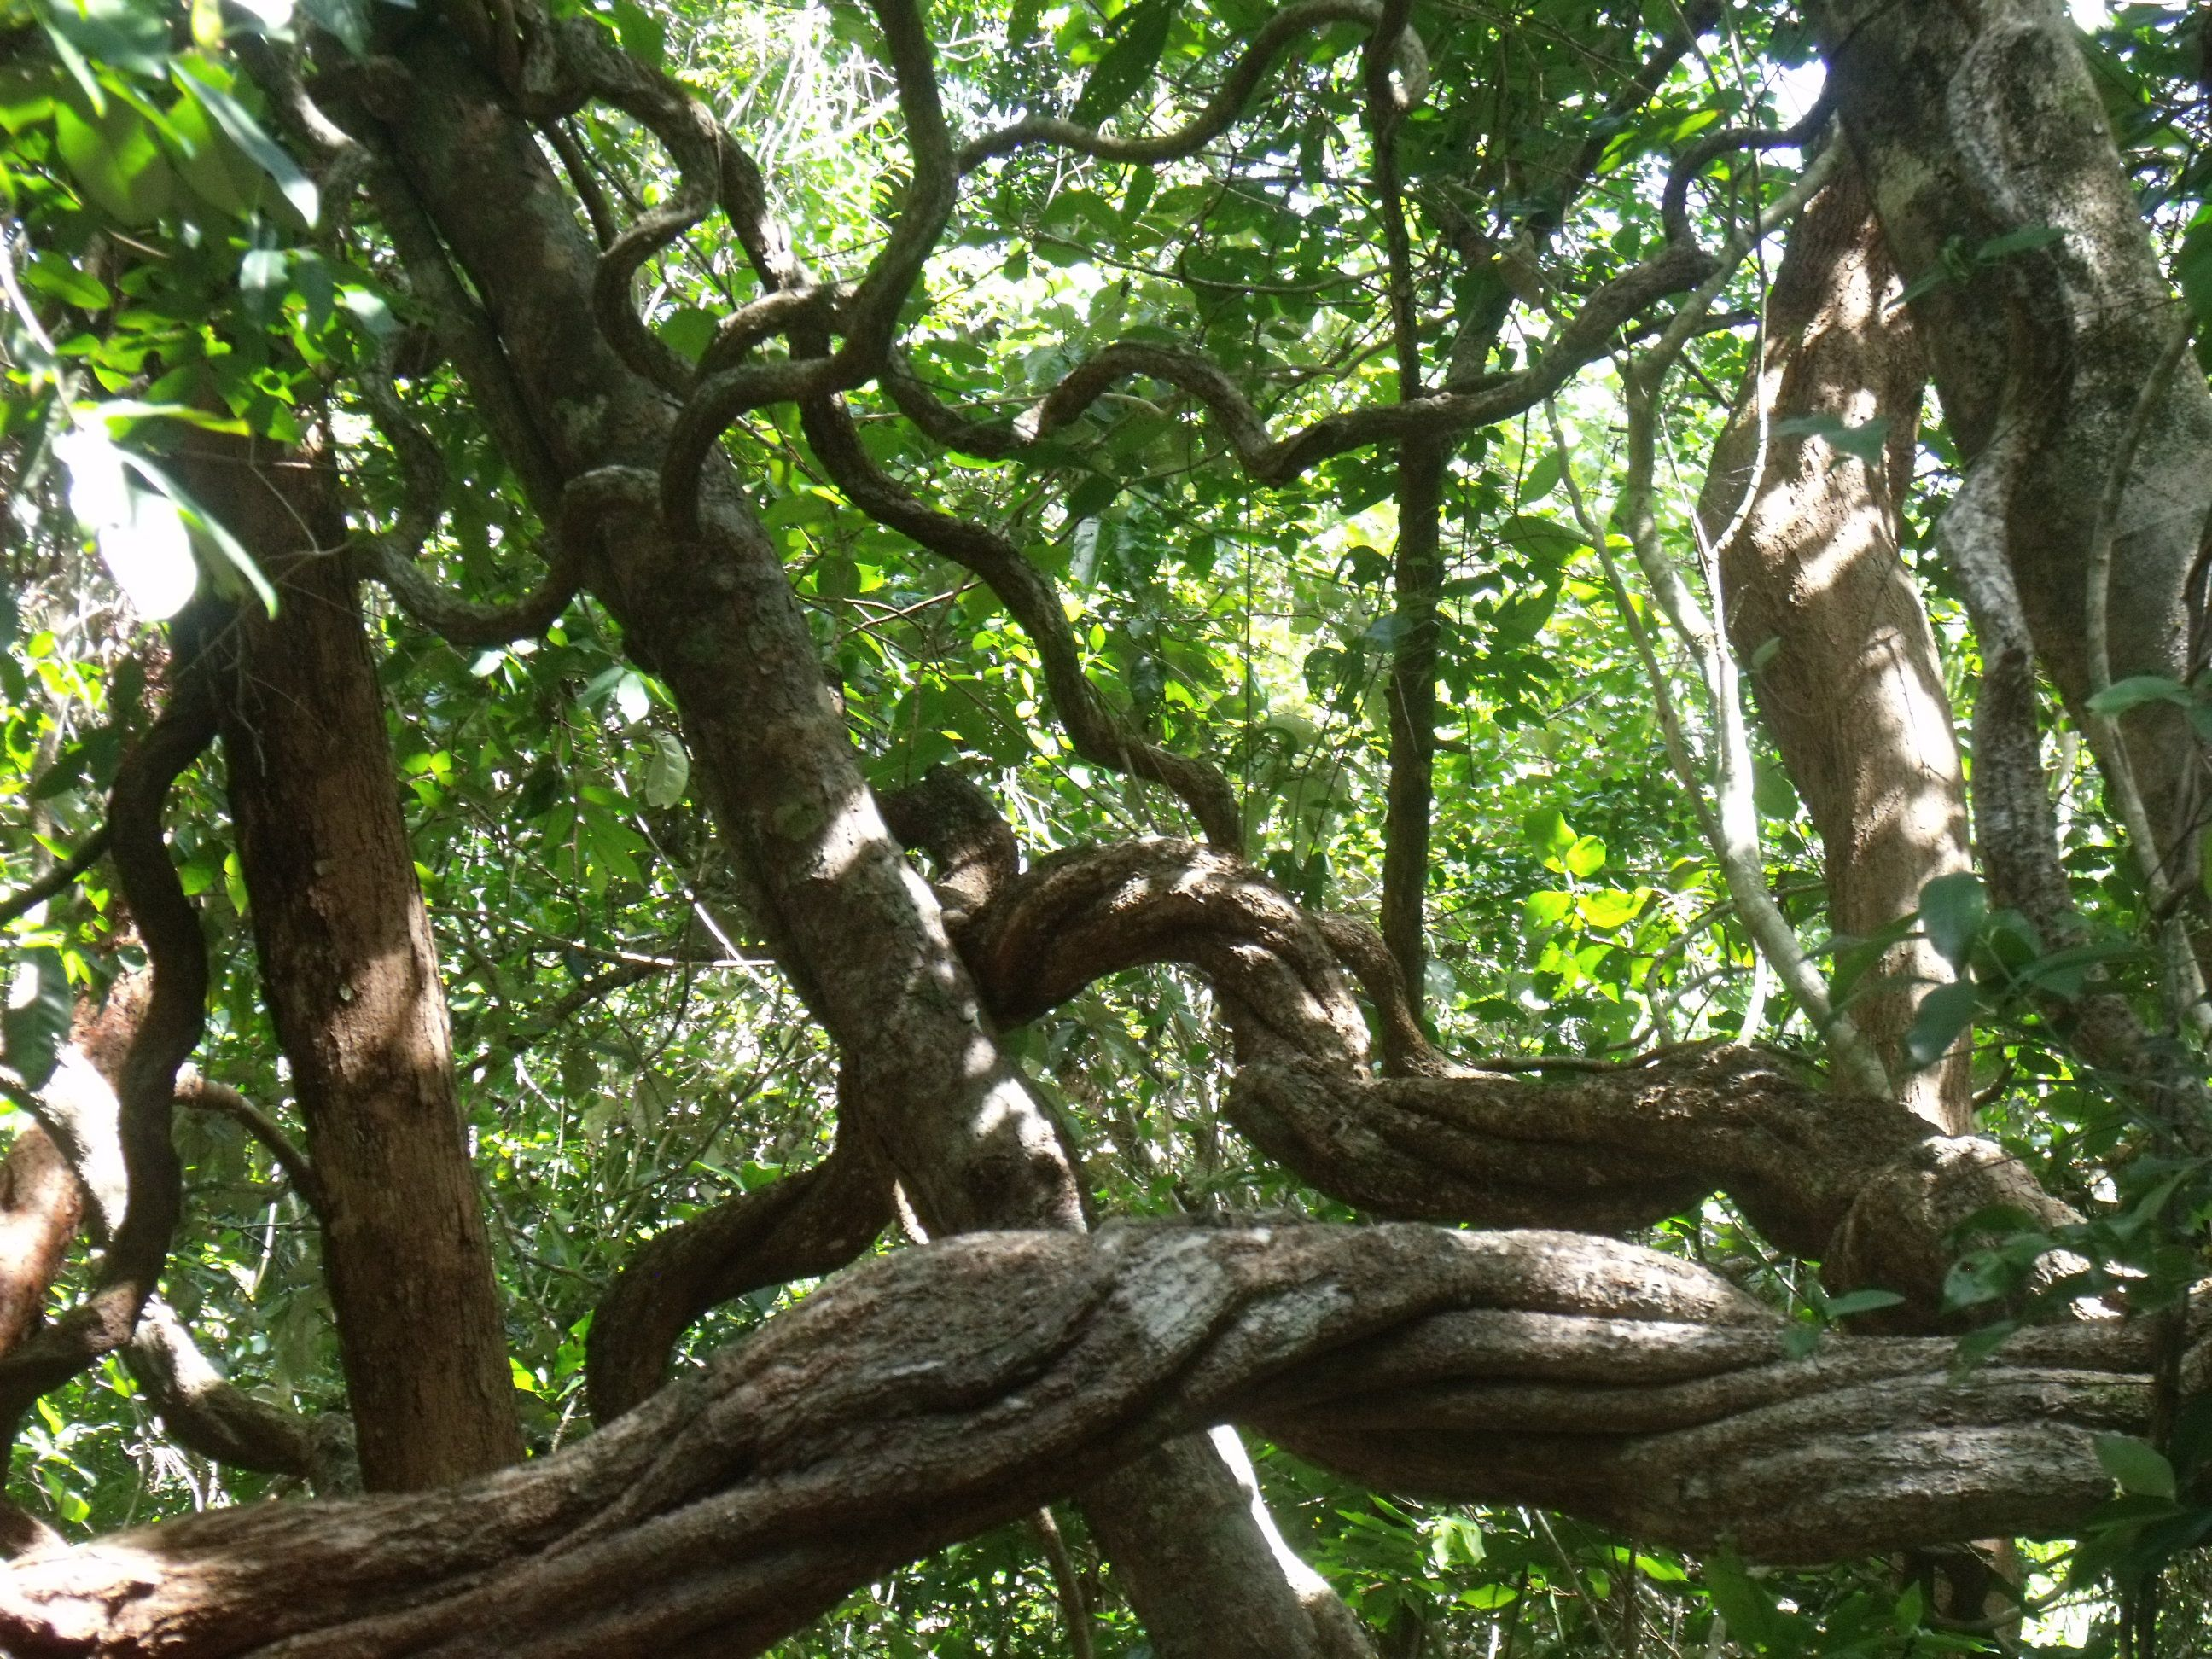 jungle vines - Google Search | Hobbit Puppets | Pinterest